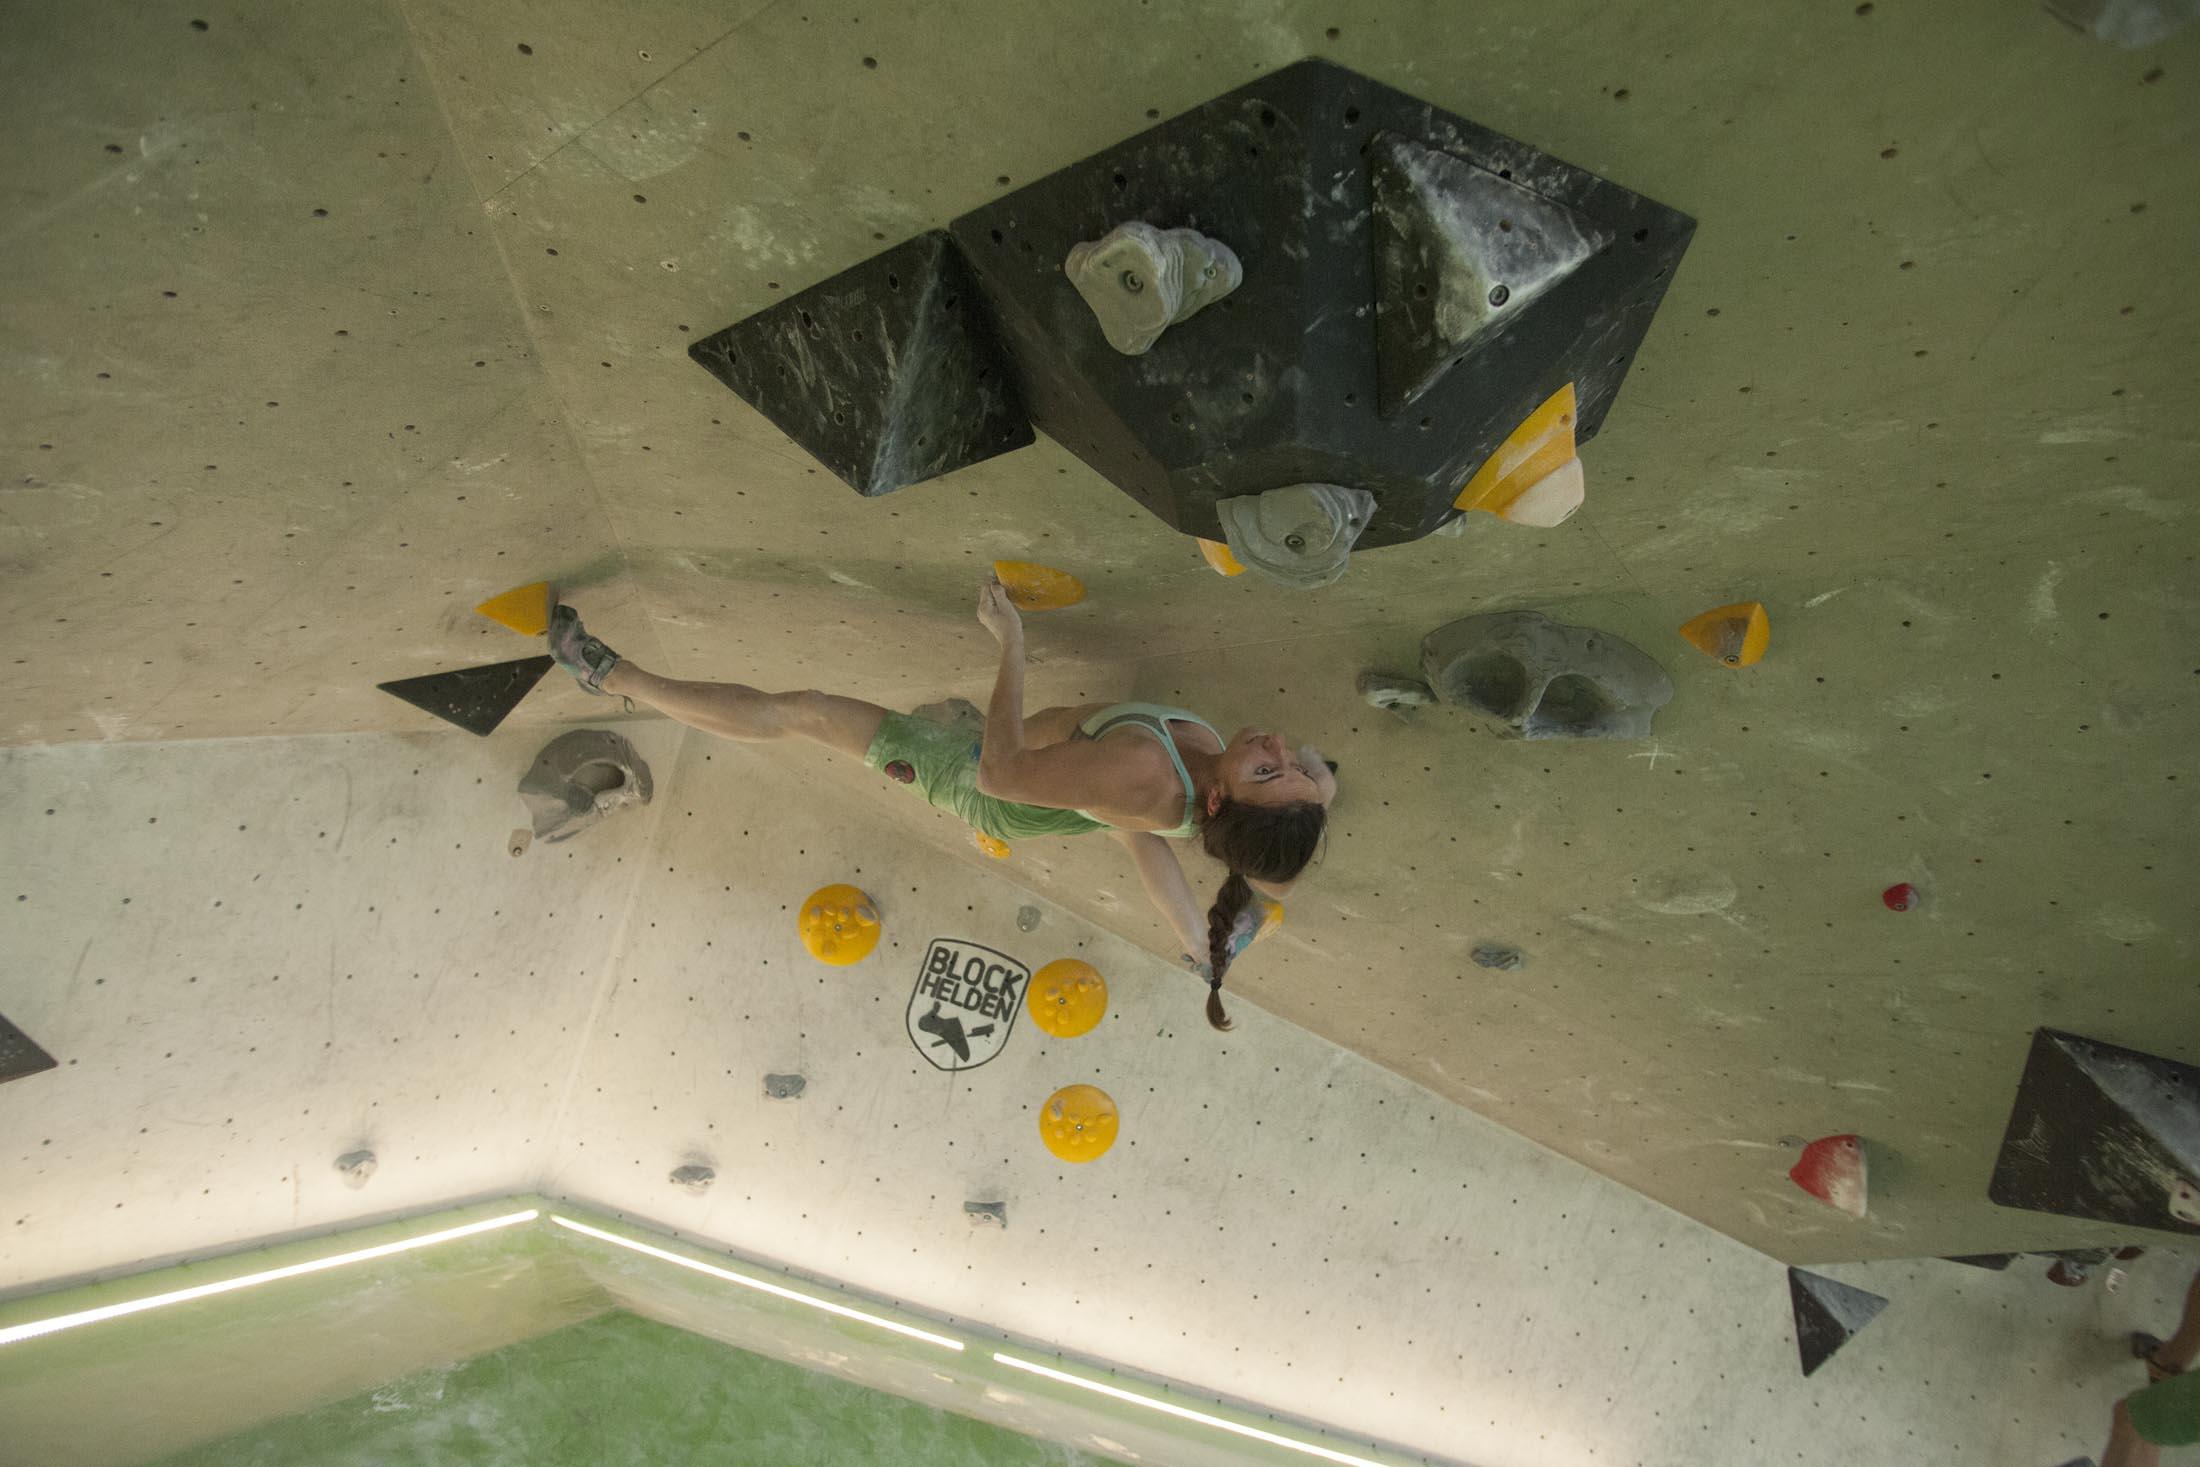 Juliane Wurm, internationaler bouldercup Frankenjura, BLOCKHELDEN Erlangen, Bergfreunde.de, Mammut07092016025